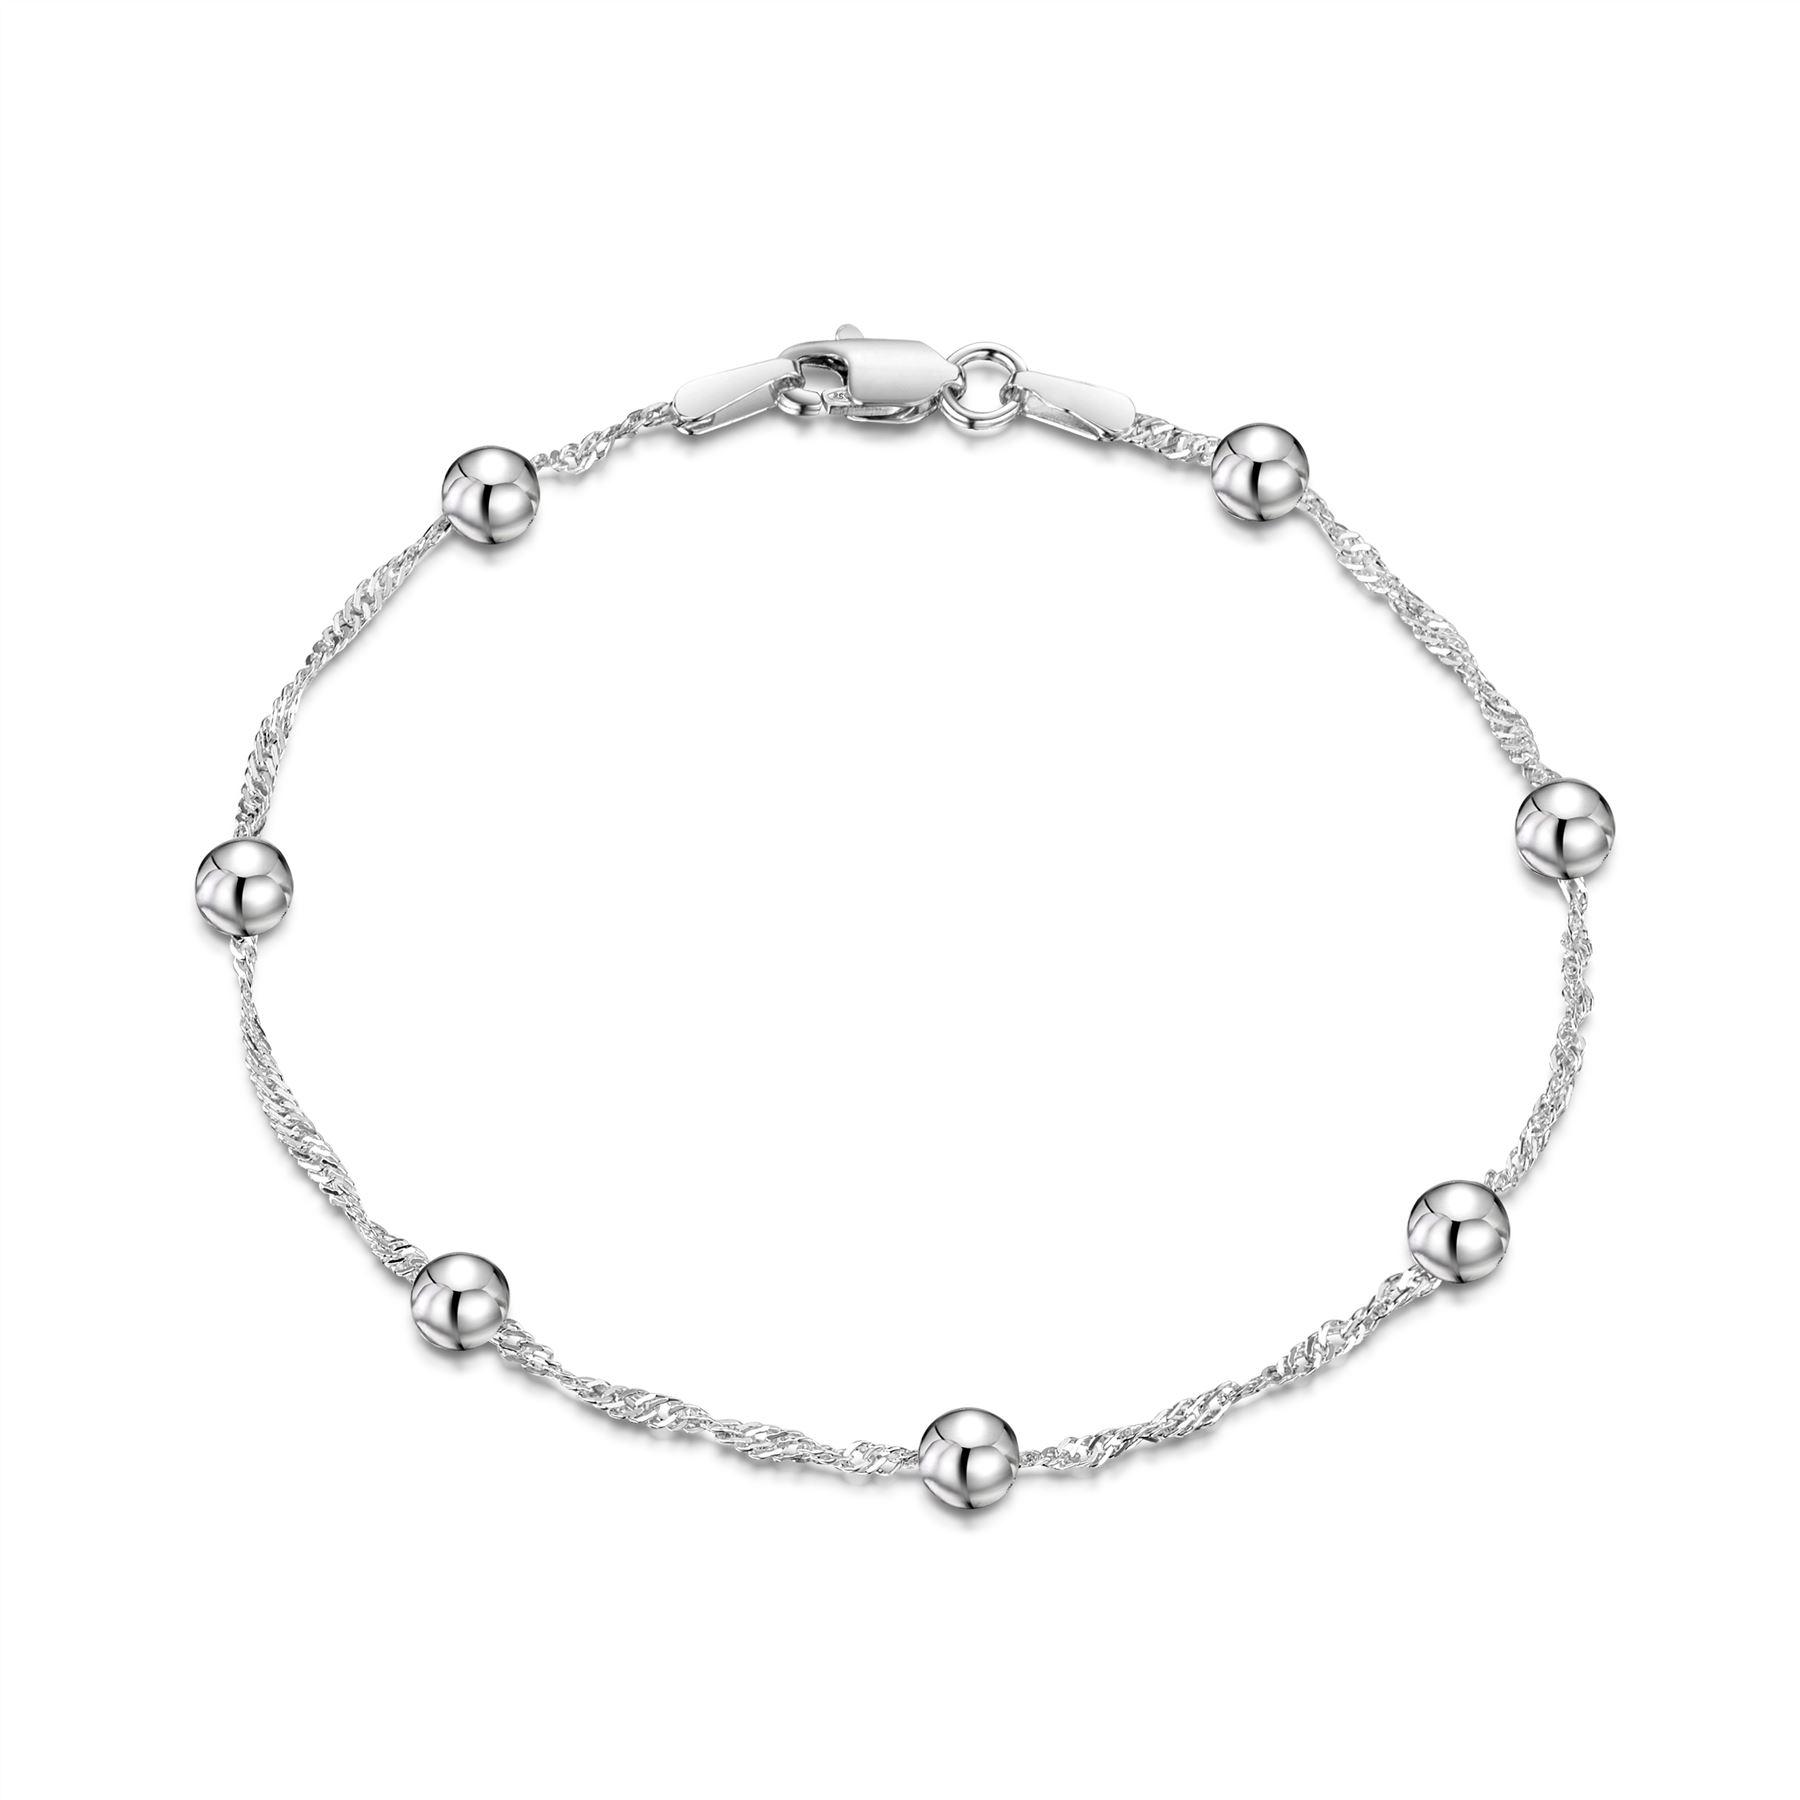 Amberta-Pulsera-en-Autentica-Plata-De-Ley-925-Brazalete-Precioso-para-Mujer miniatura 17